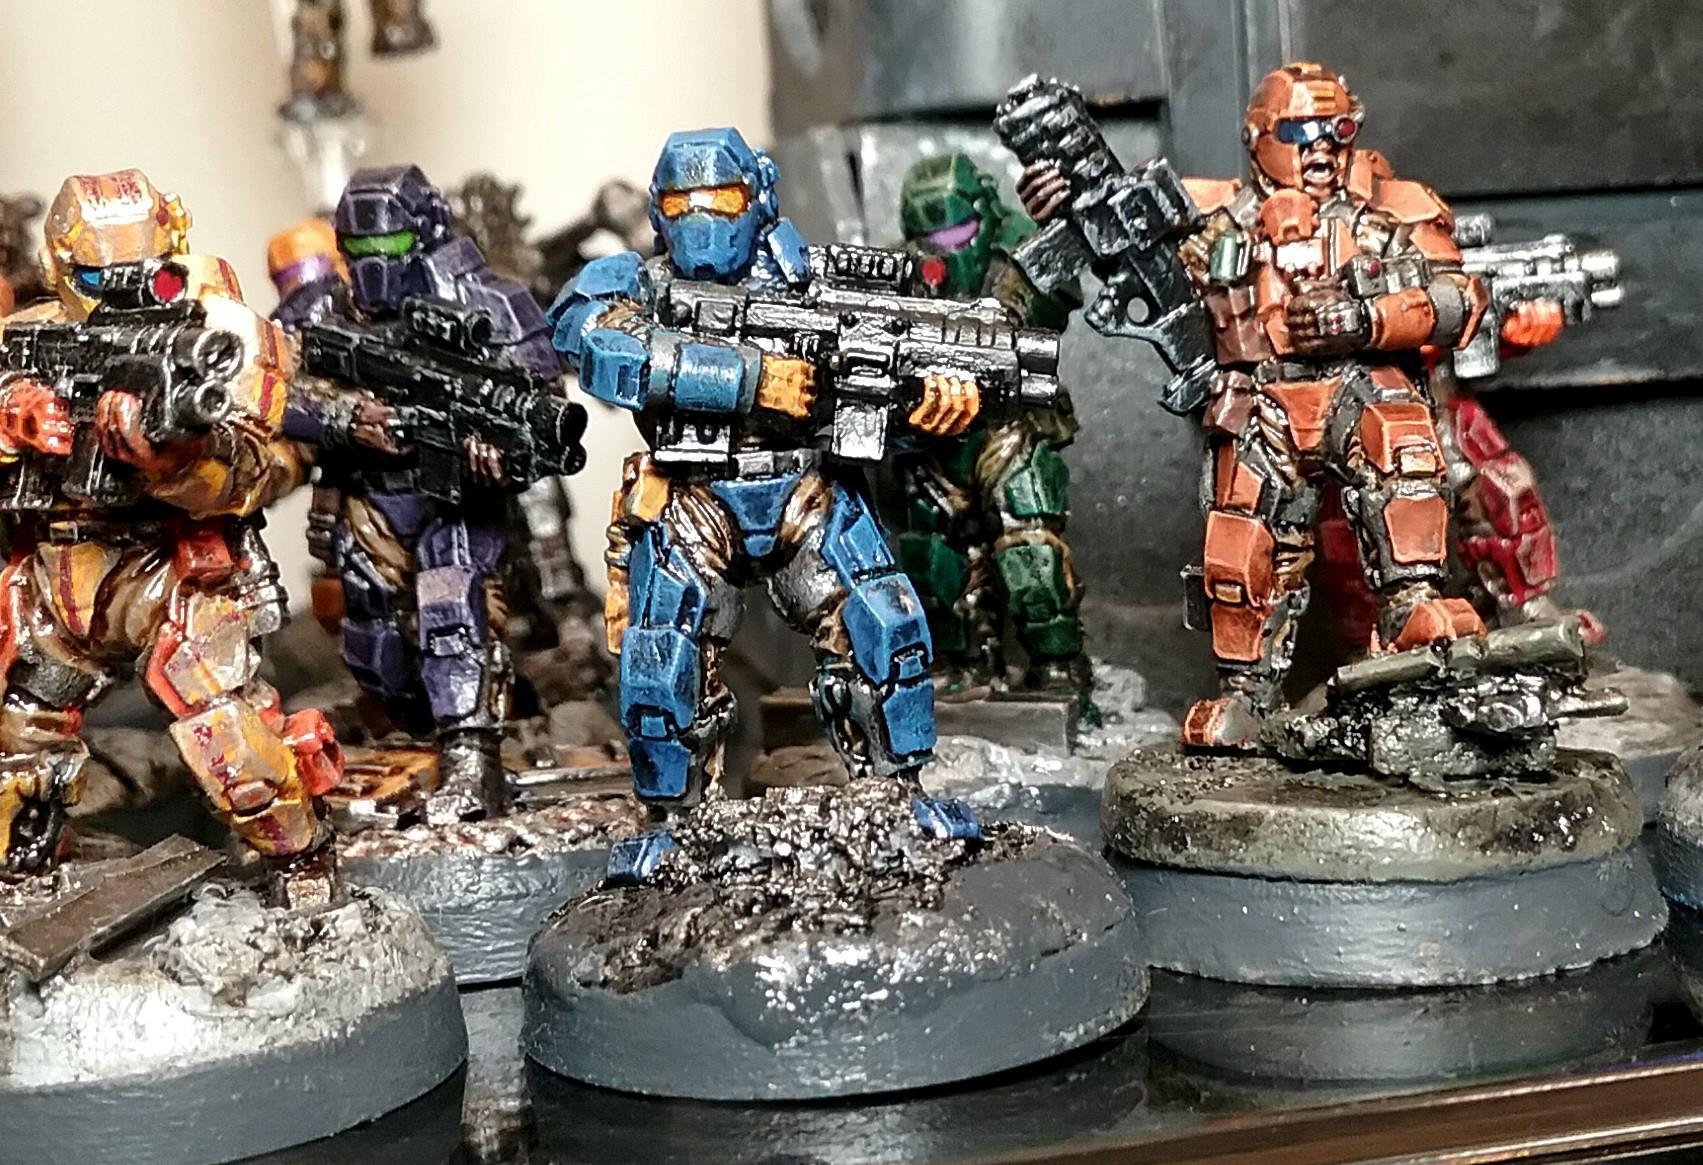 Afterlife, Republic, Republic Grenadiers